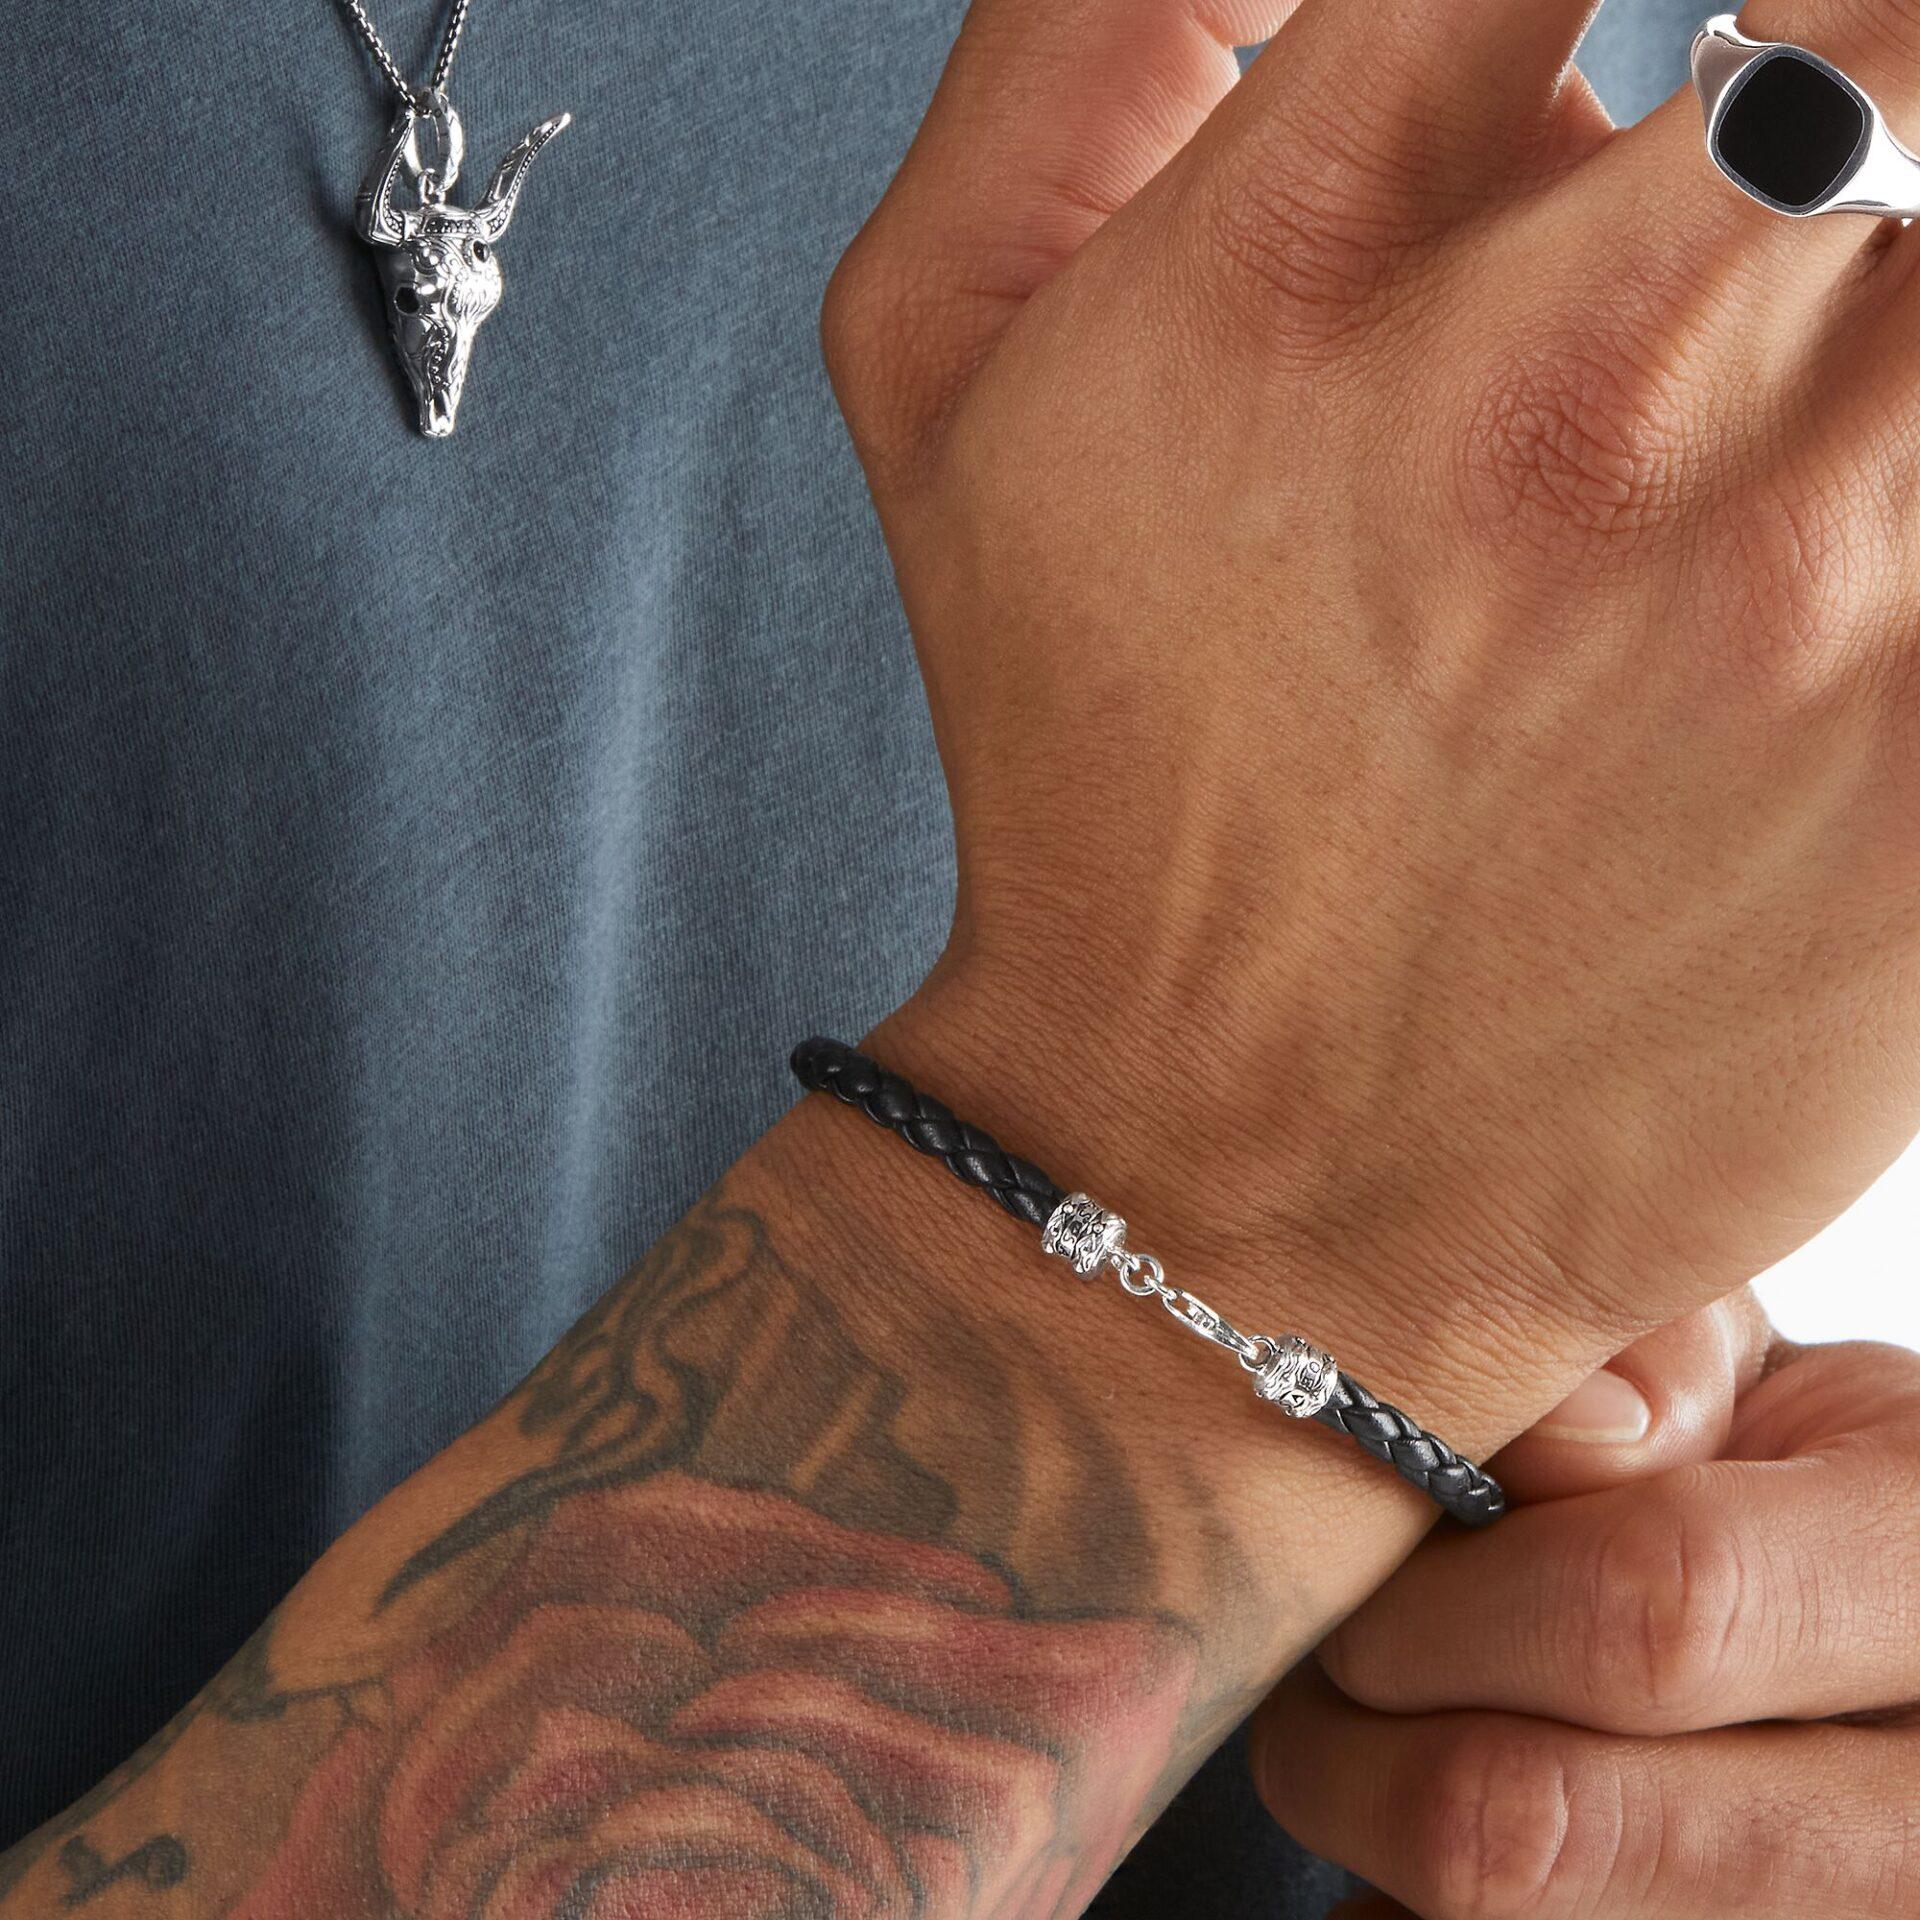 Bracelet en cuir tressé noir, Thomas Sabo